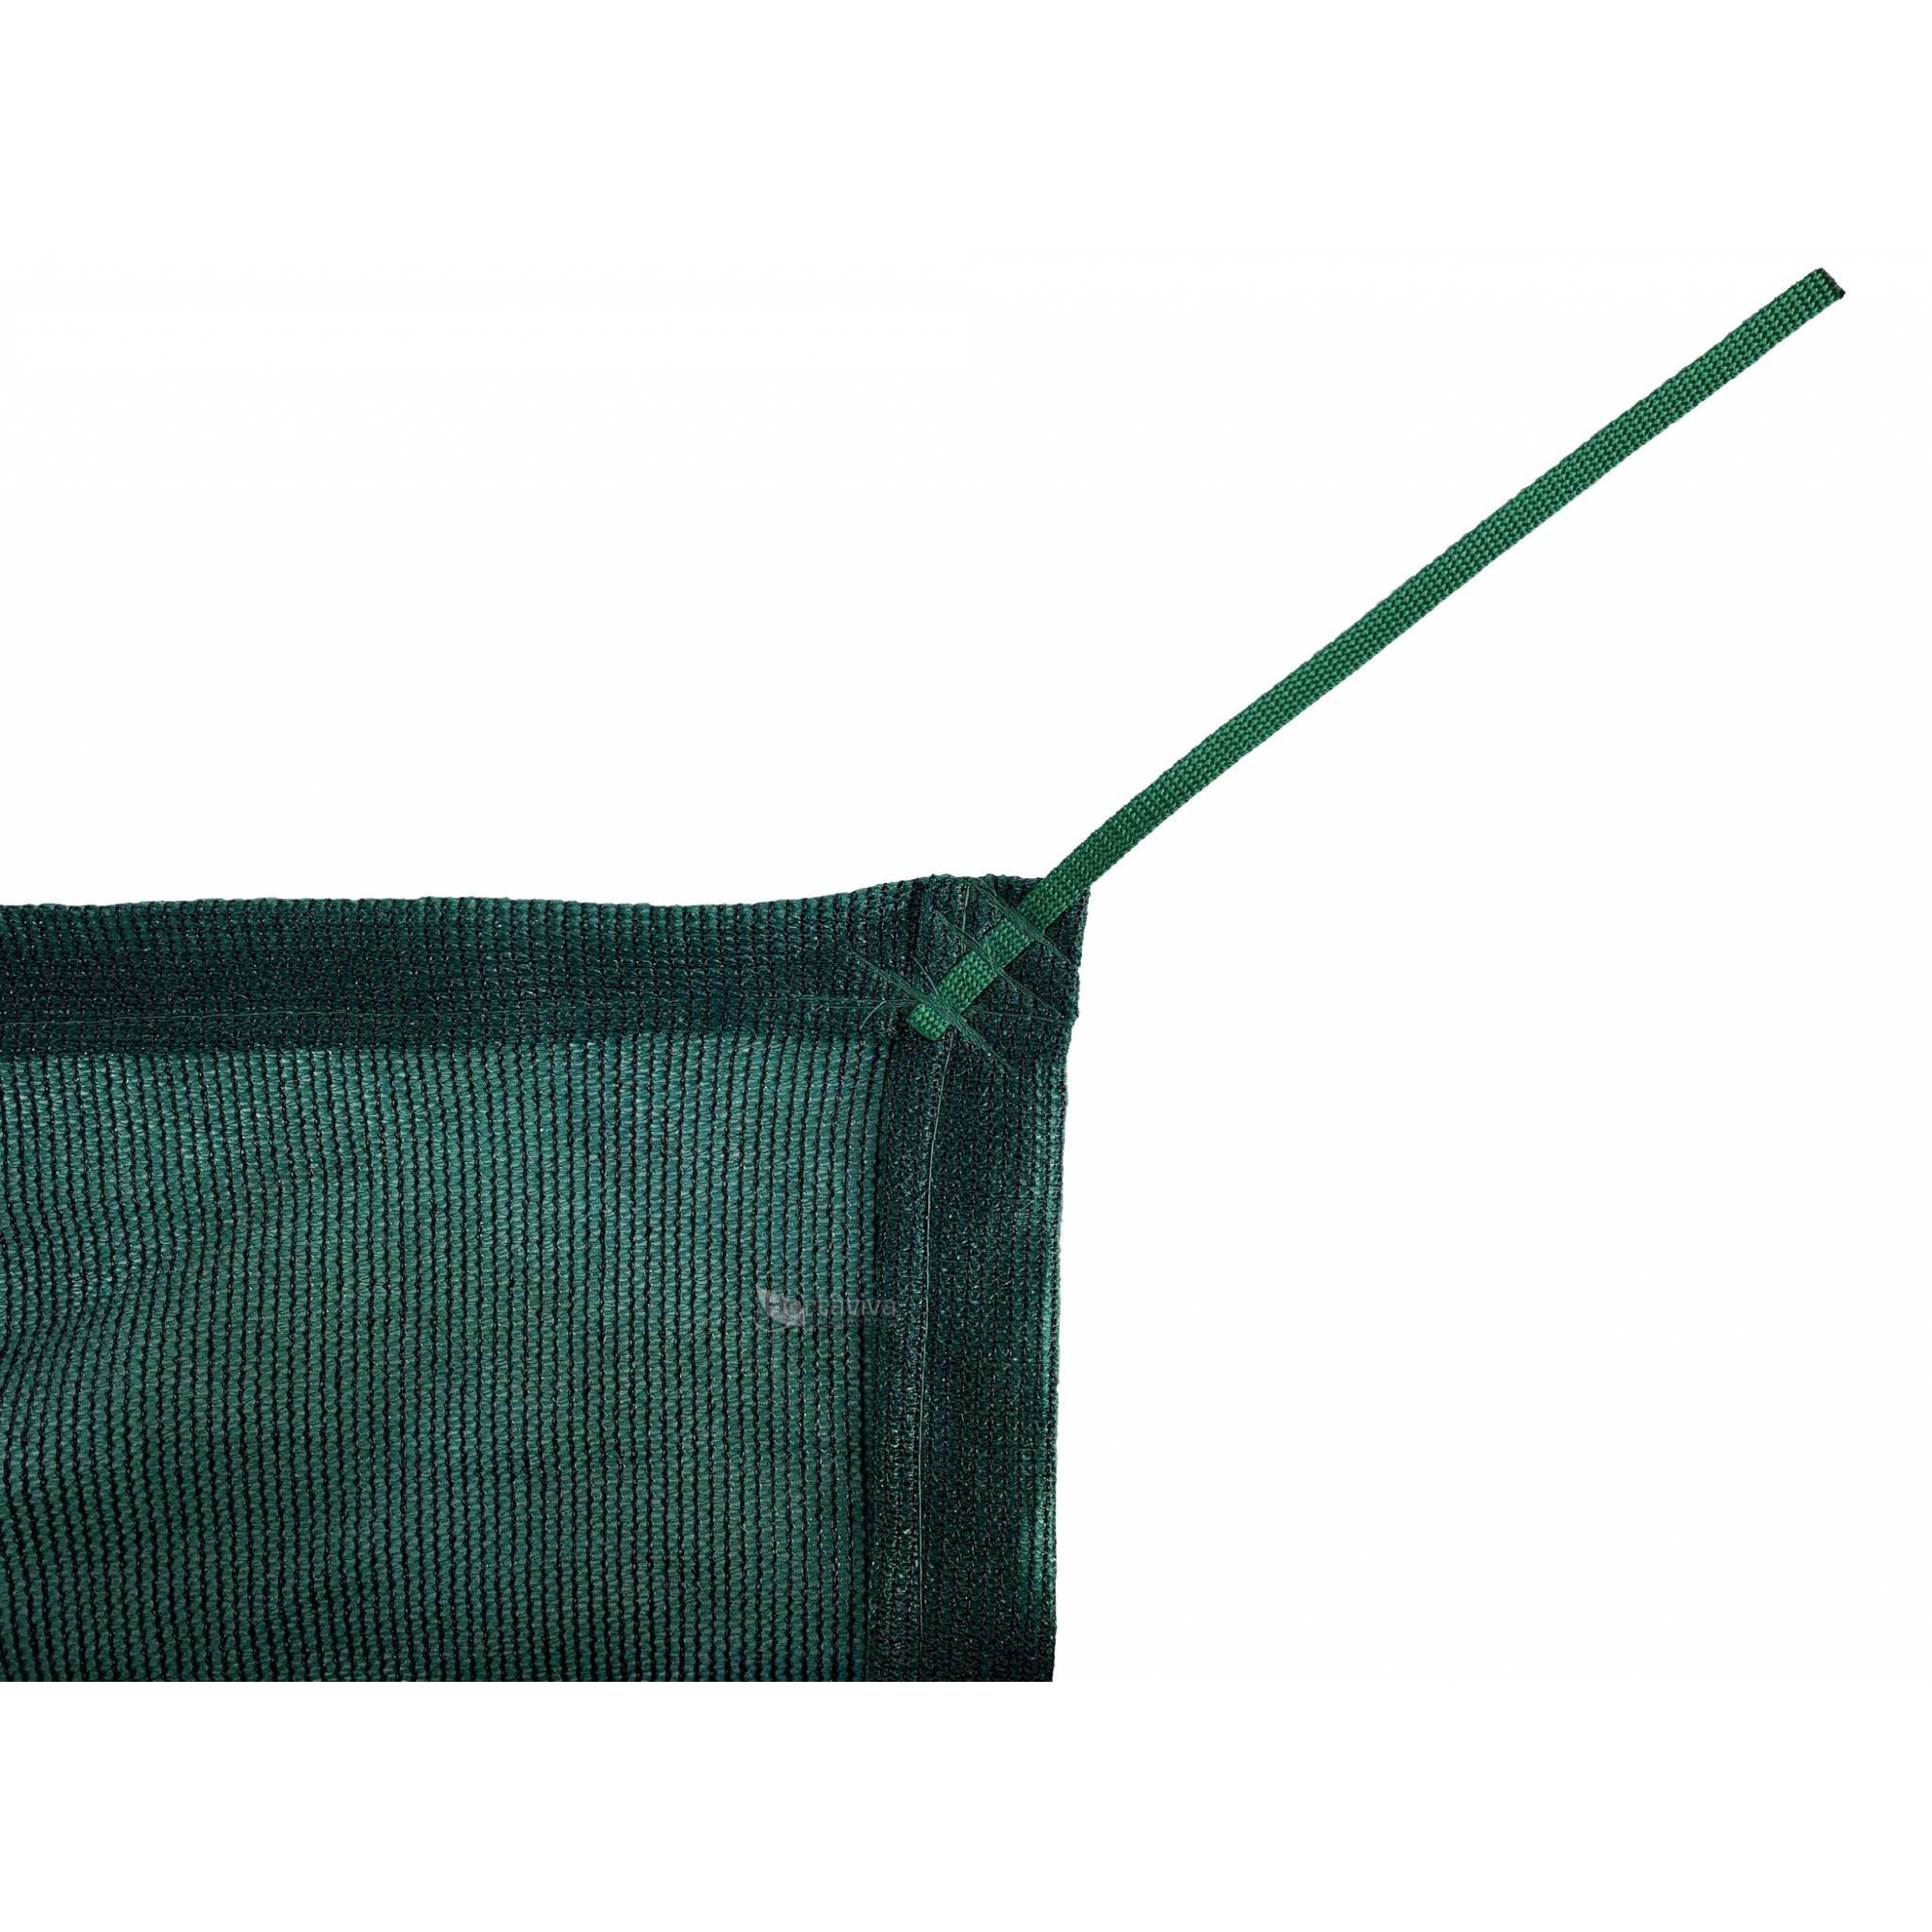 Tela de Sombreamento 80% Verde com Esticadores - Largura: 2,5 Metros